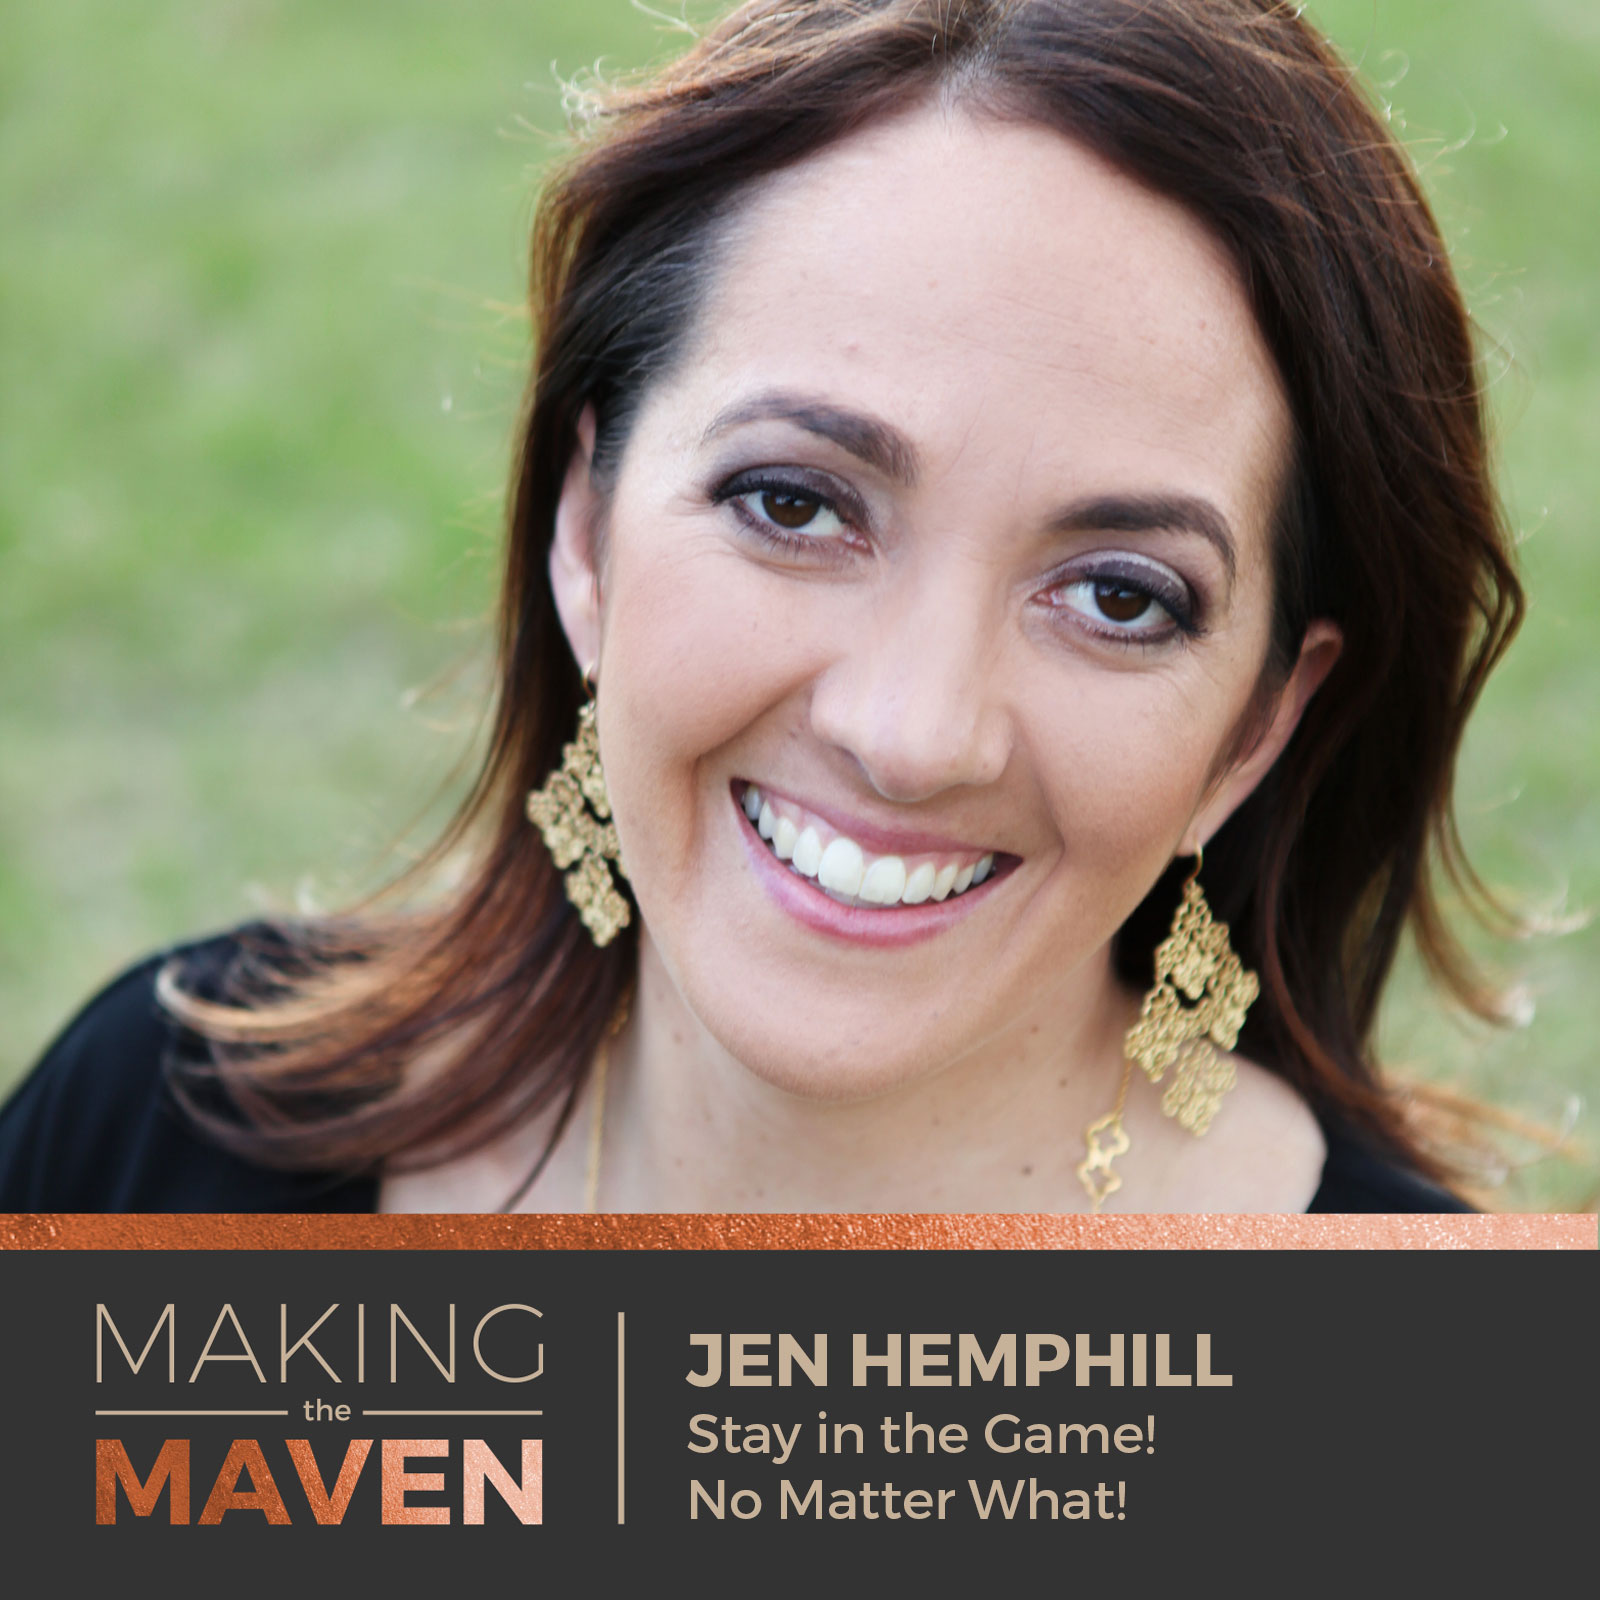 Jen Hemphill